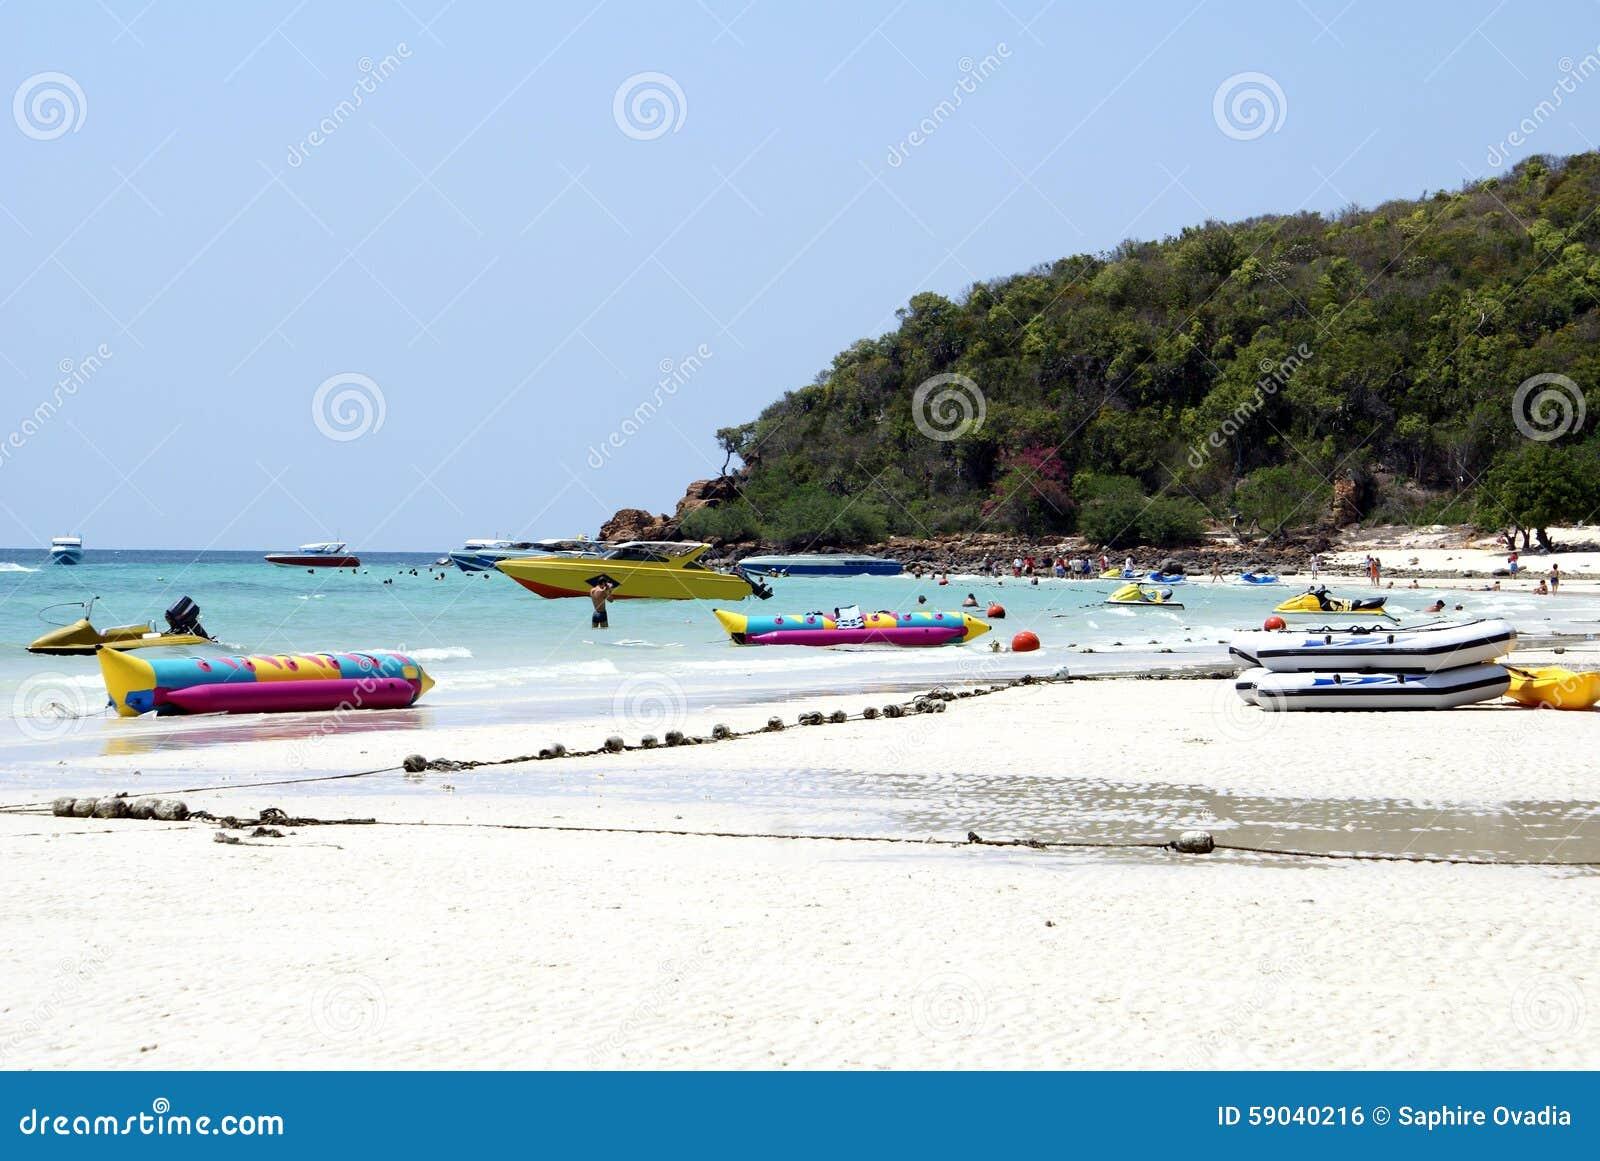 Ko Lan Island, Koh Hae Island, Or Coral Island In Pattaya, Thailand, Asia. St...